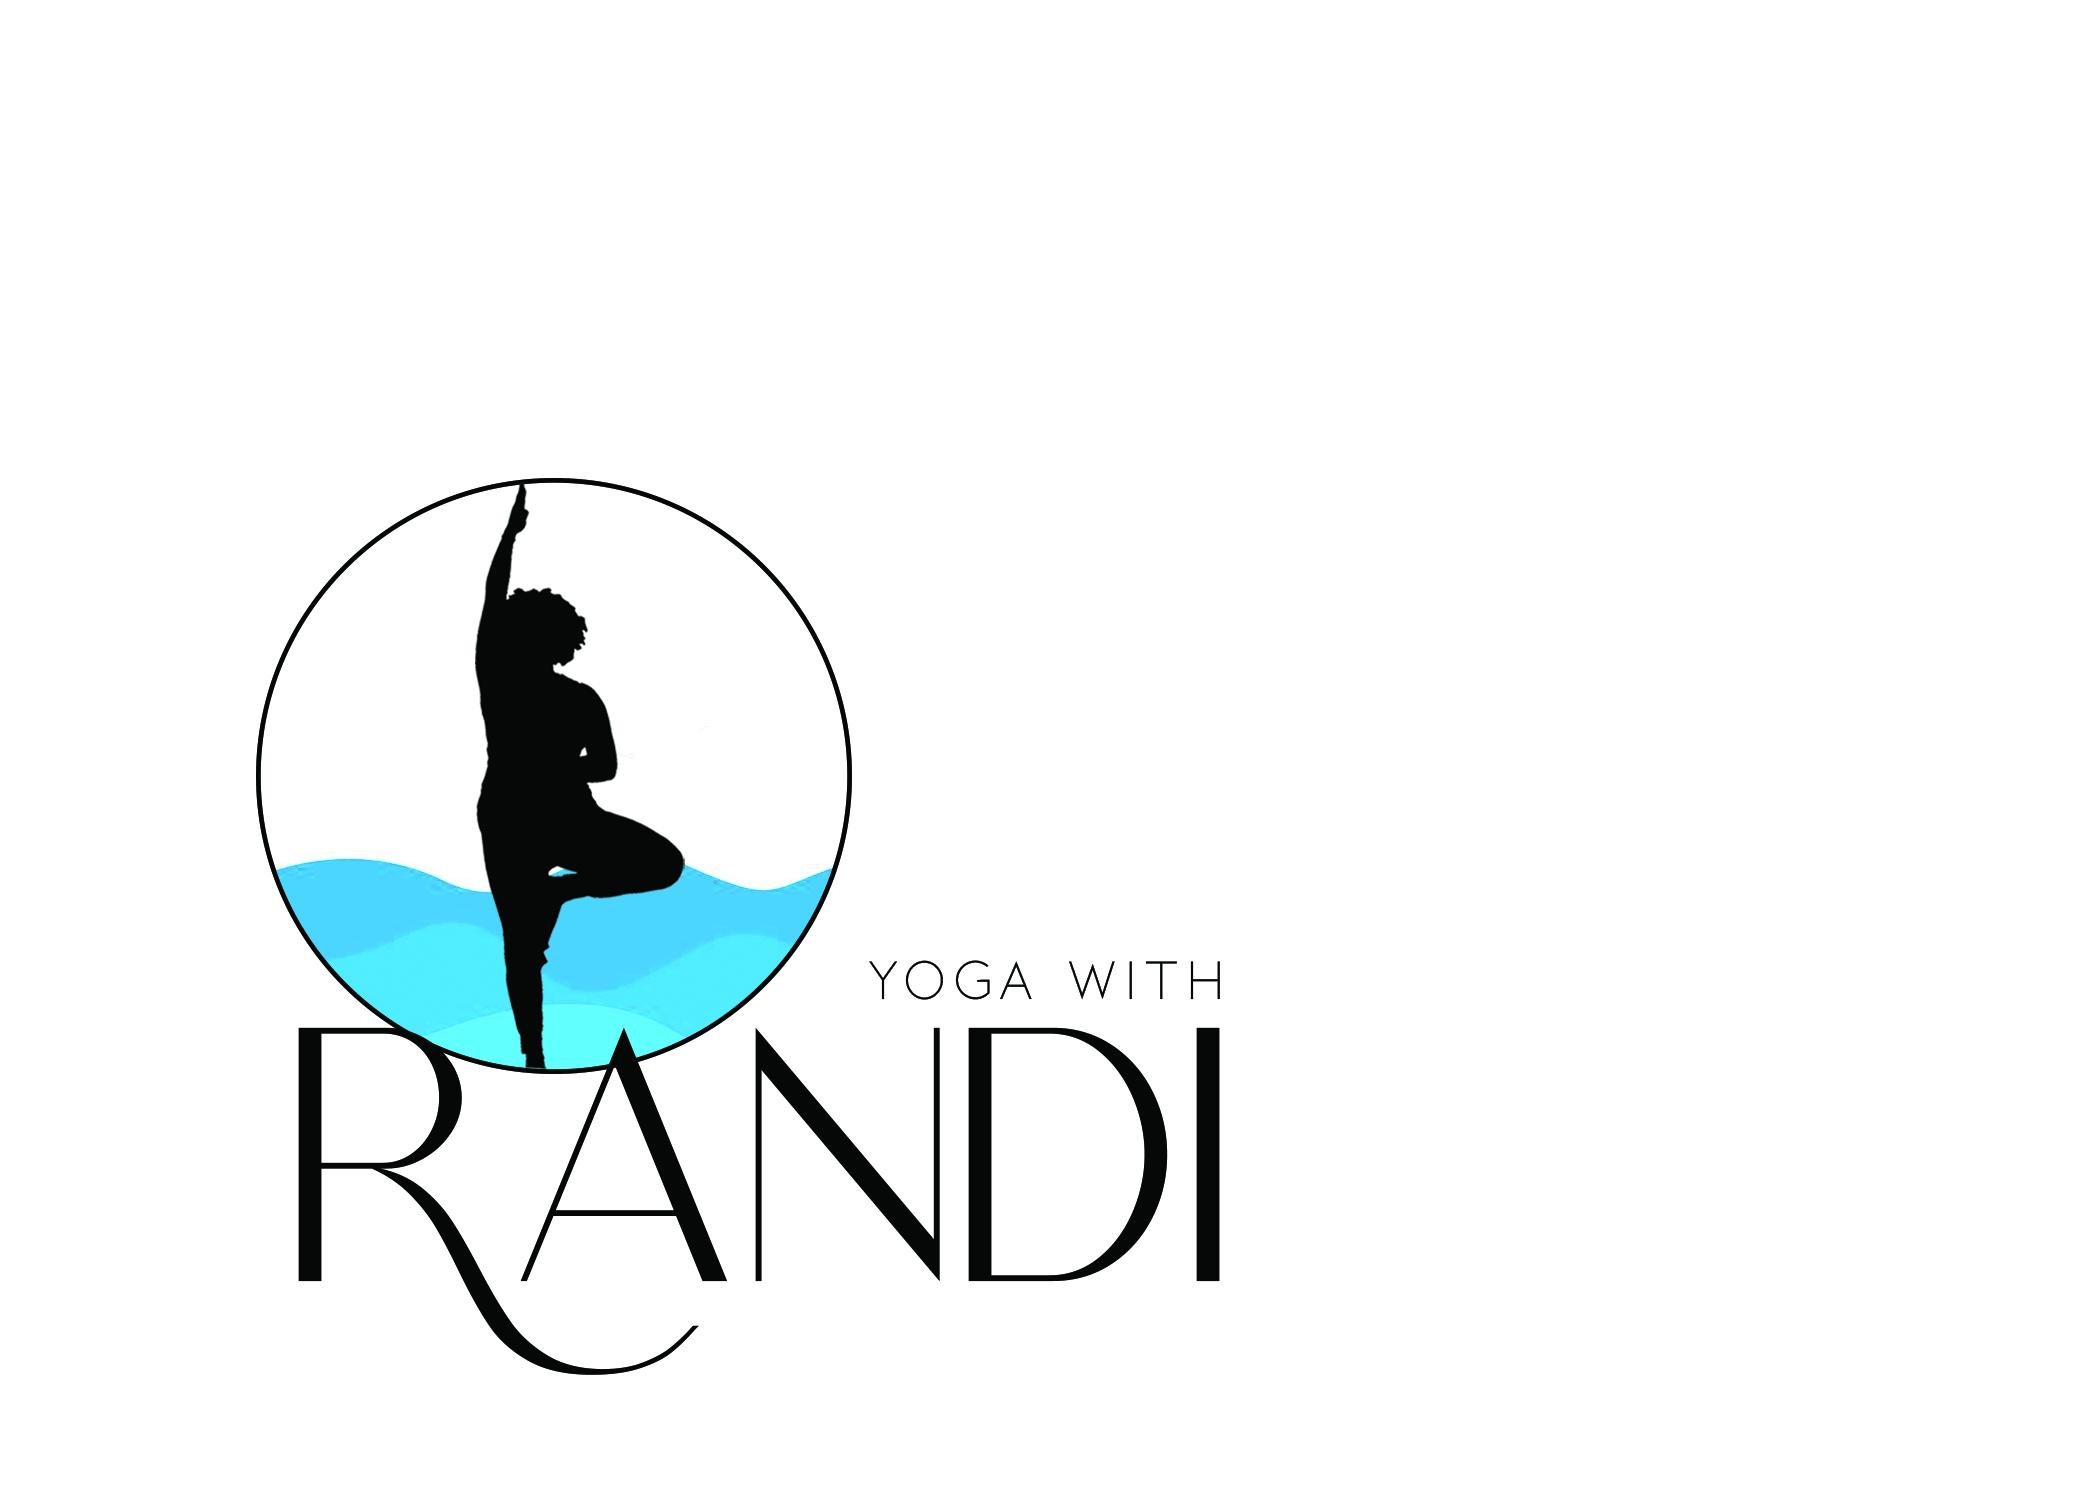 Randi's logo blue waves